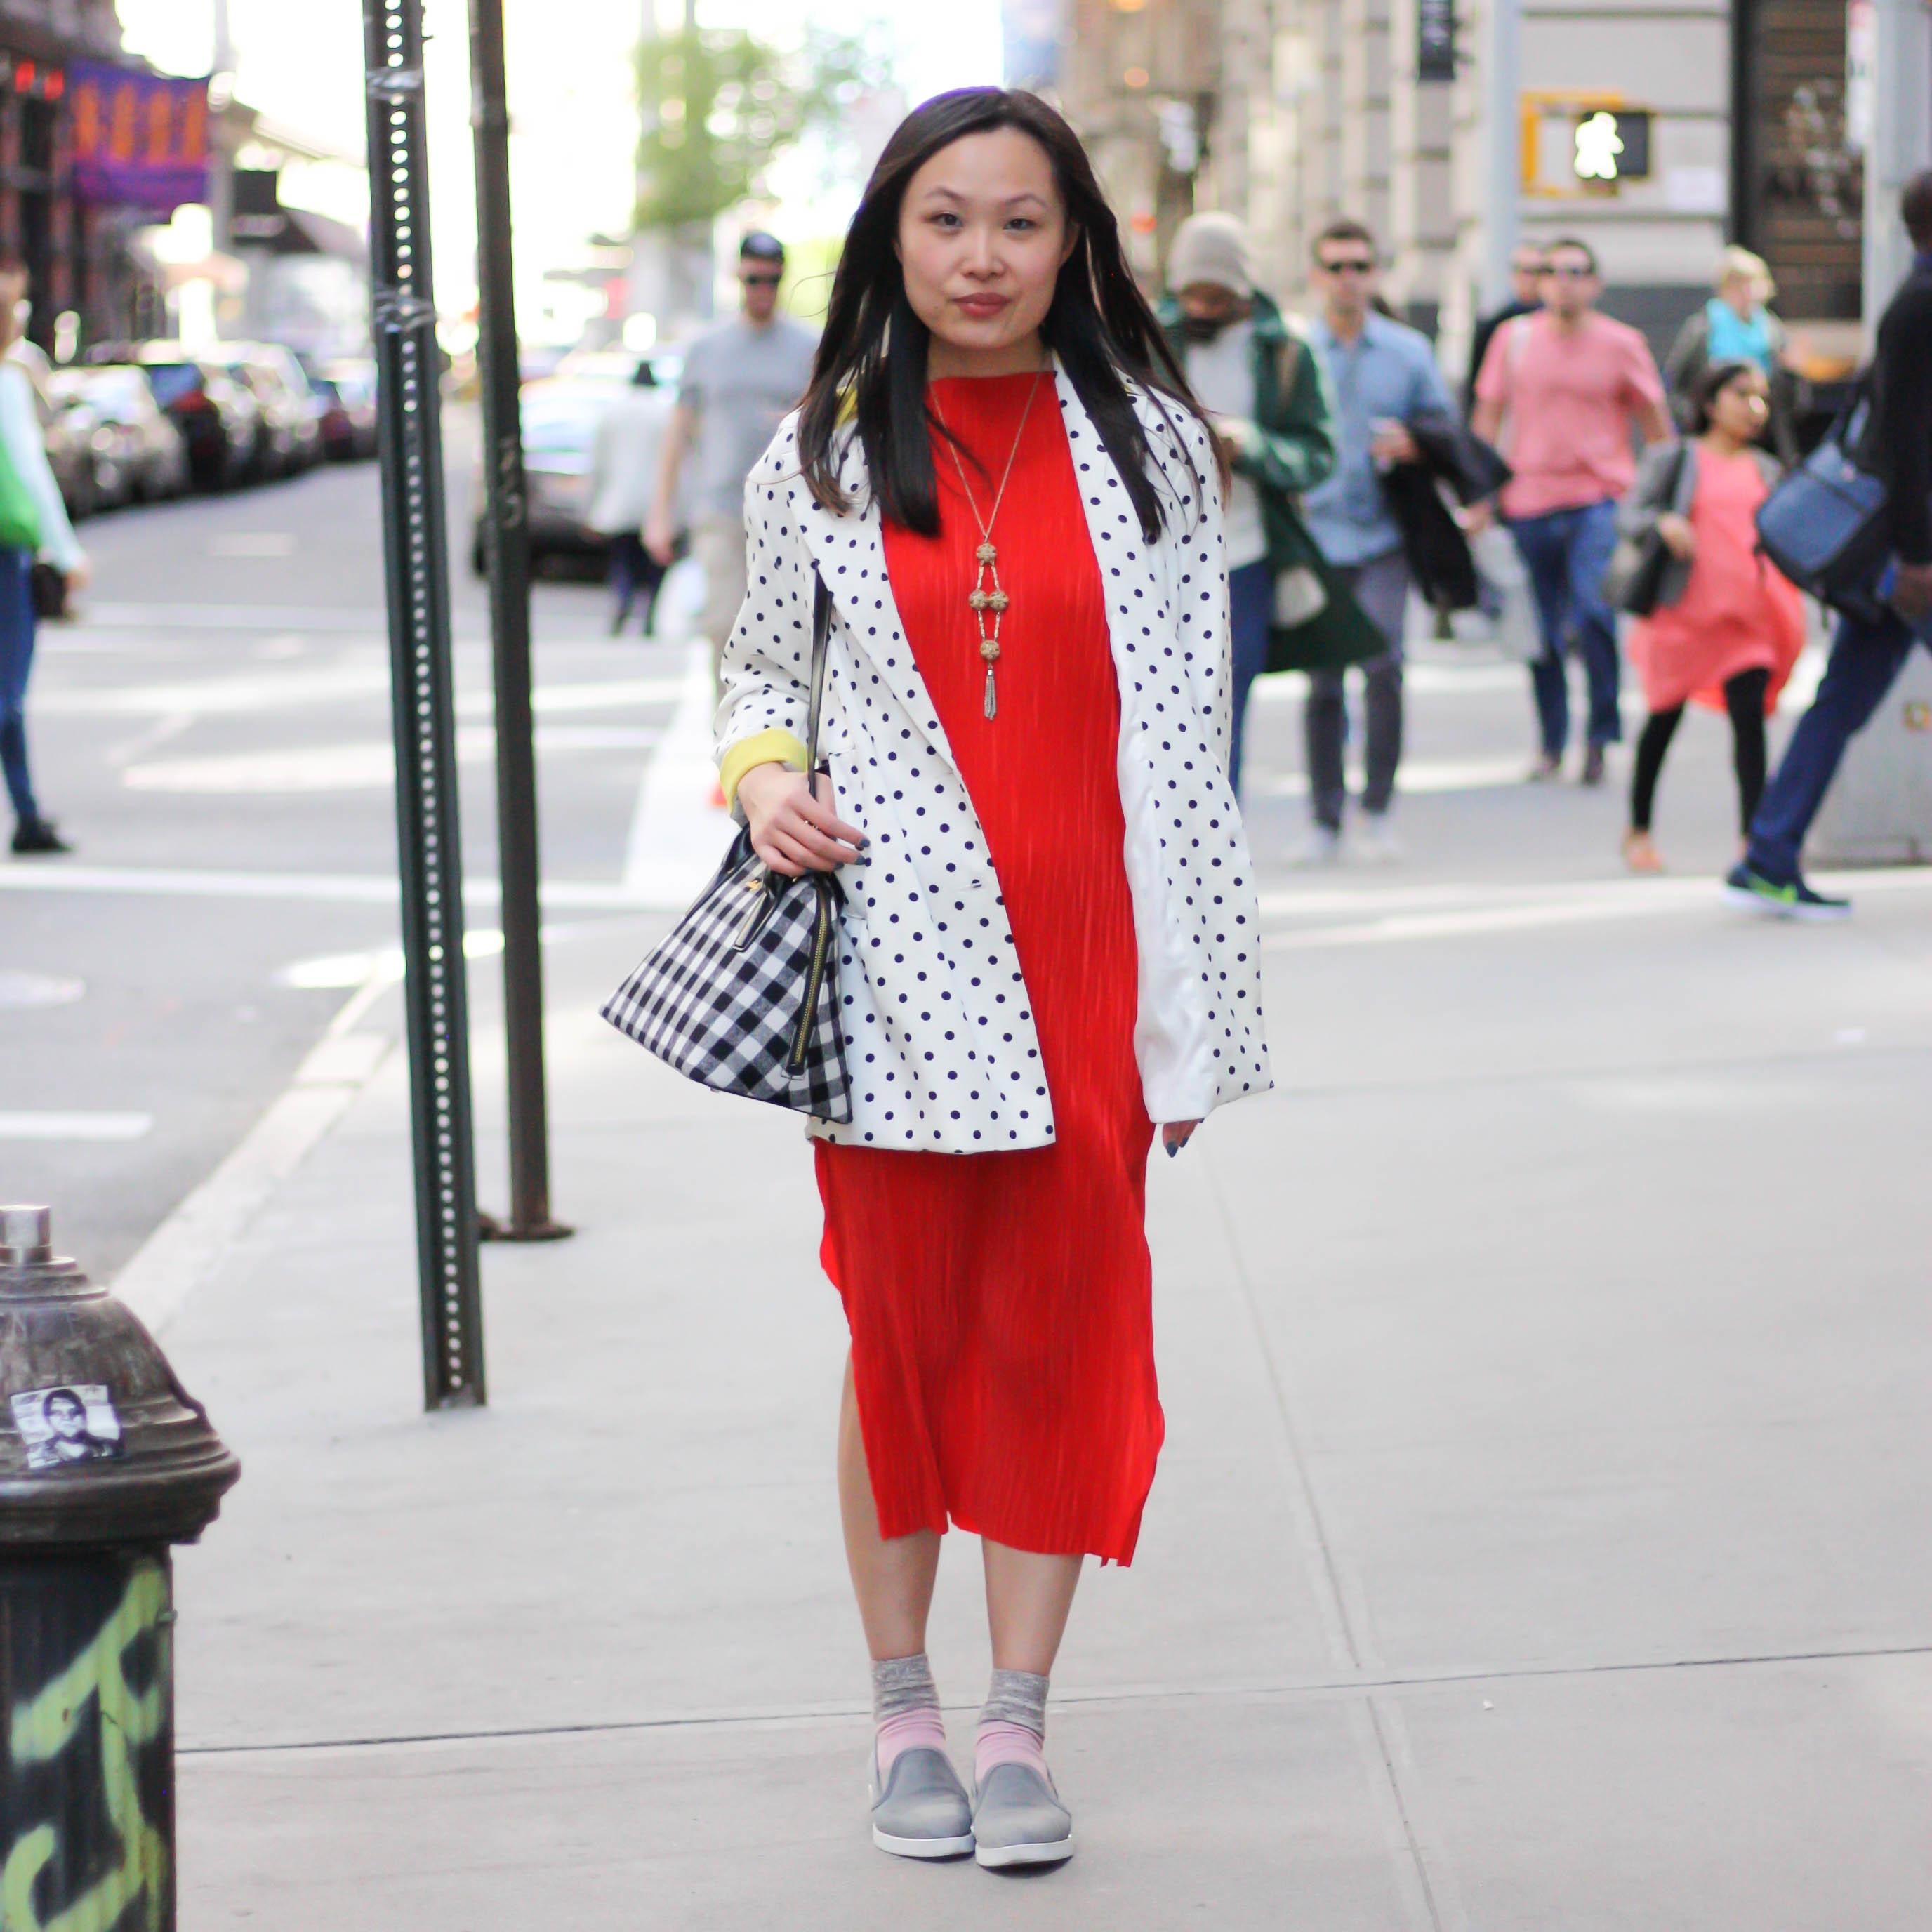 bd26959ec91952 Women's Black and White Geometric Leather Tote Bag, Grey Slip-on Sneakers, Red  Midi Dress, White and Black Polka Dot Blazer | Women's Fashion | Lookastic  UK